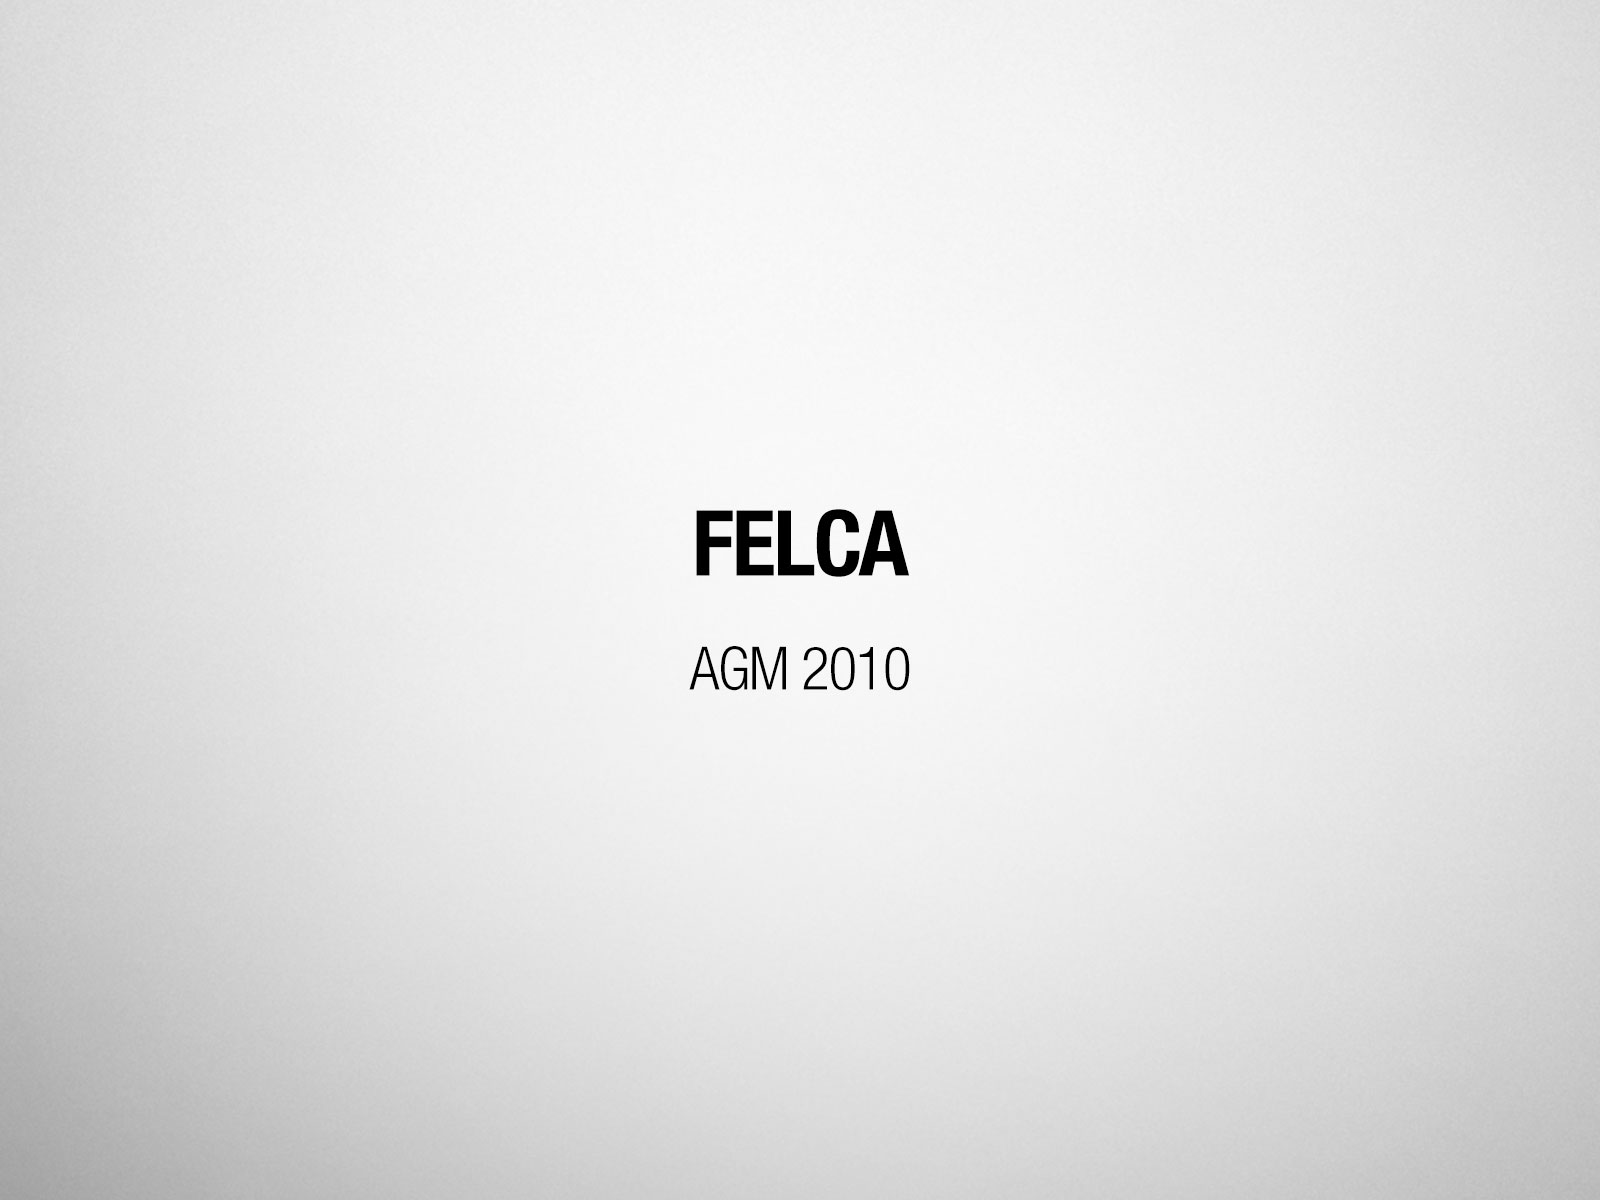 FELCA AGM 2010